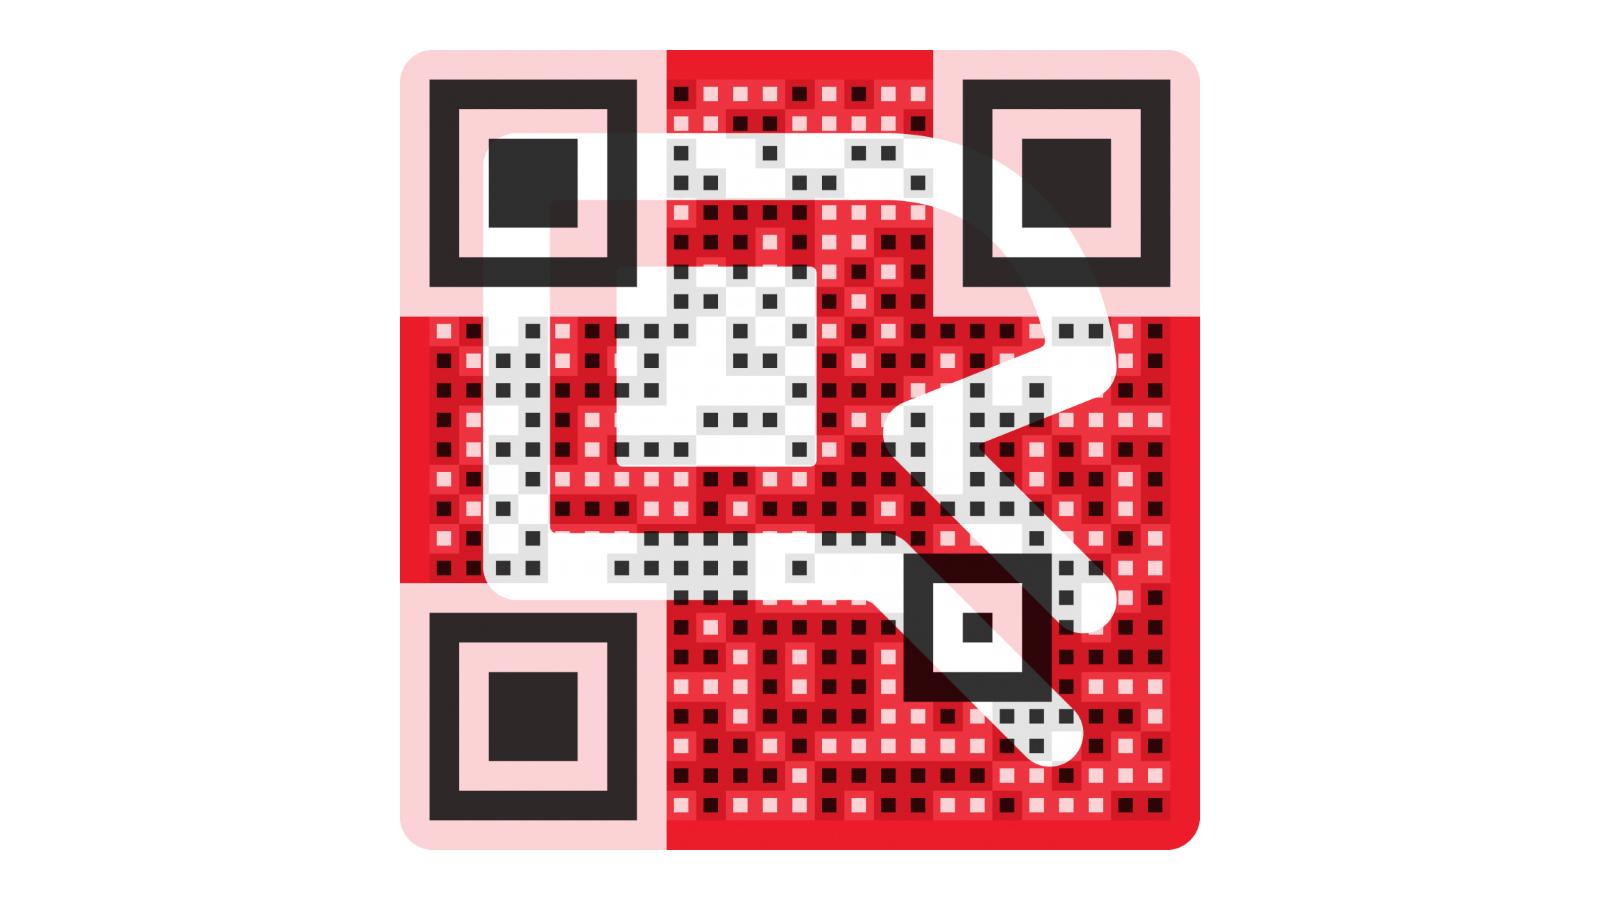 Qr Code Generator Kostenlos Erstellen